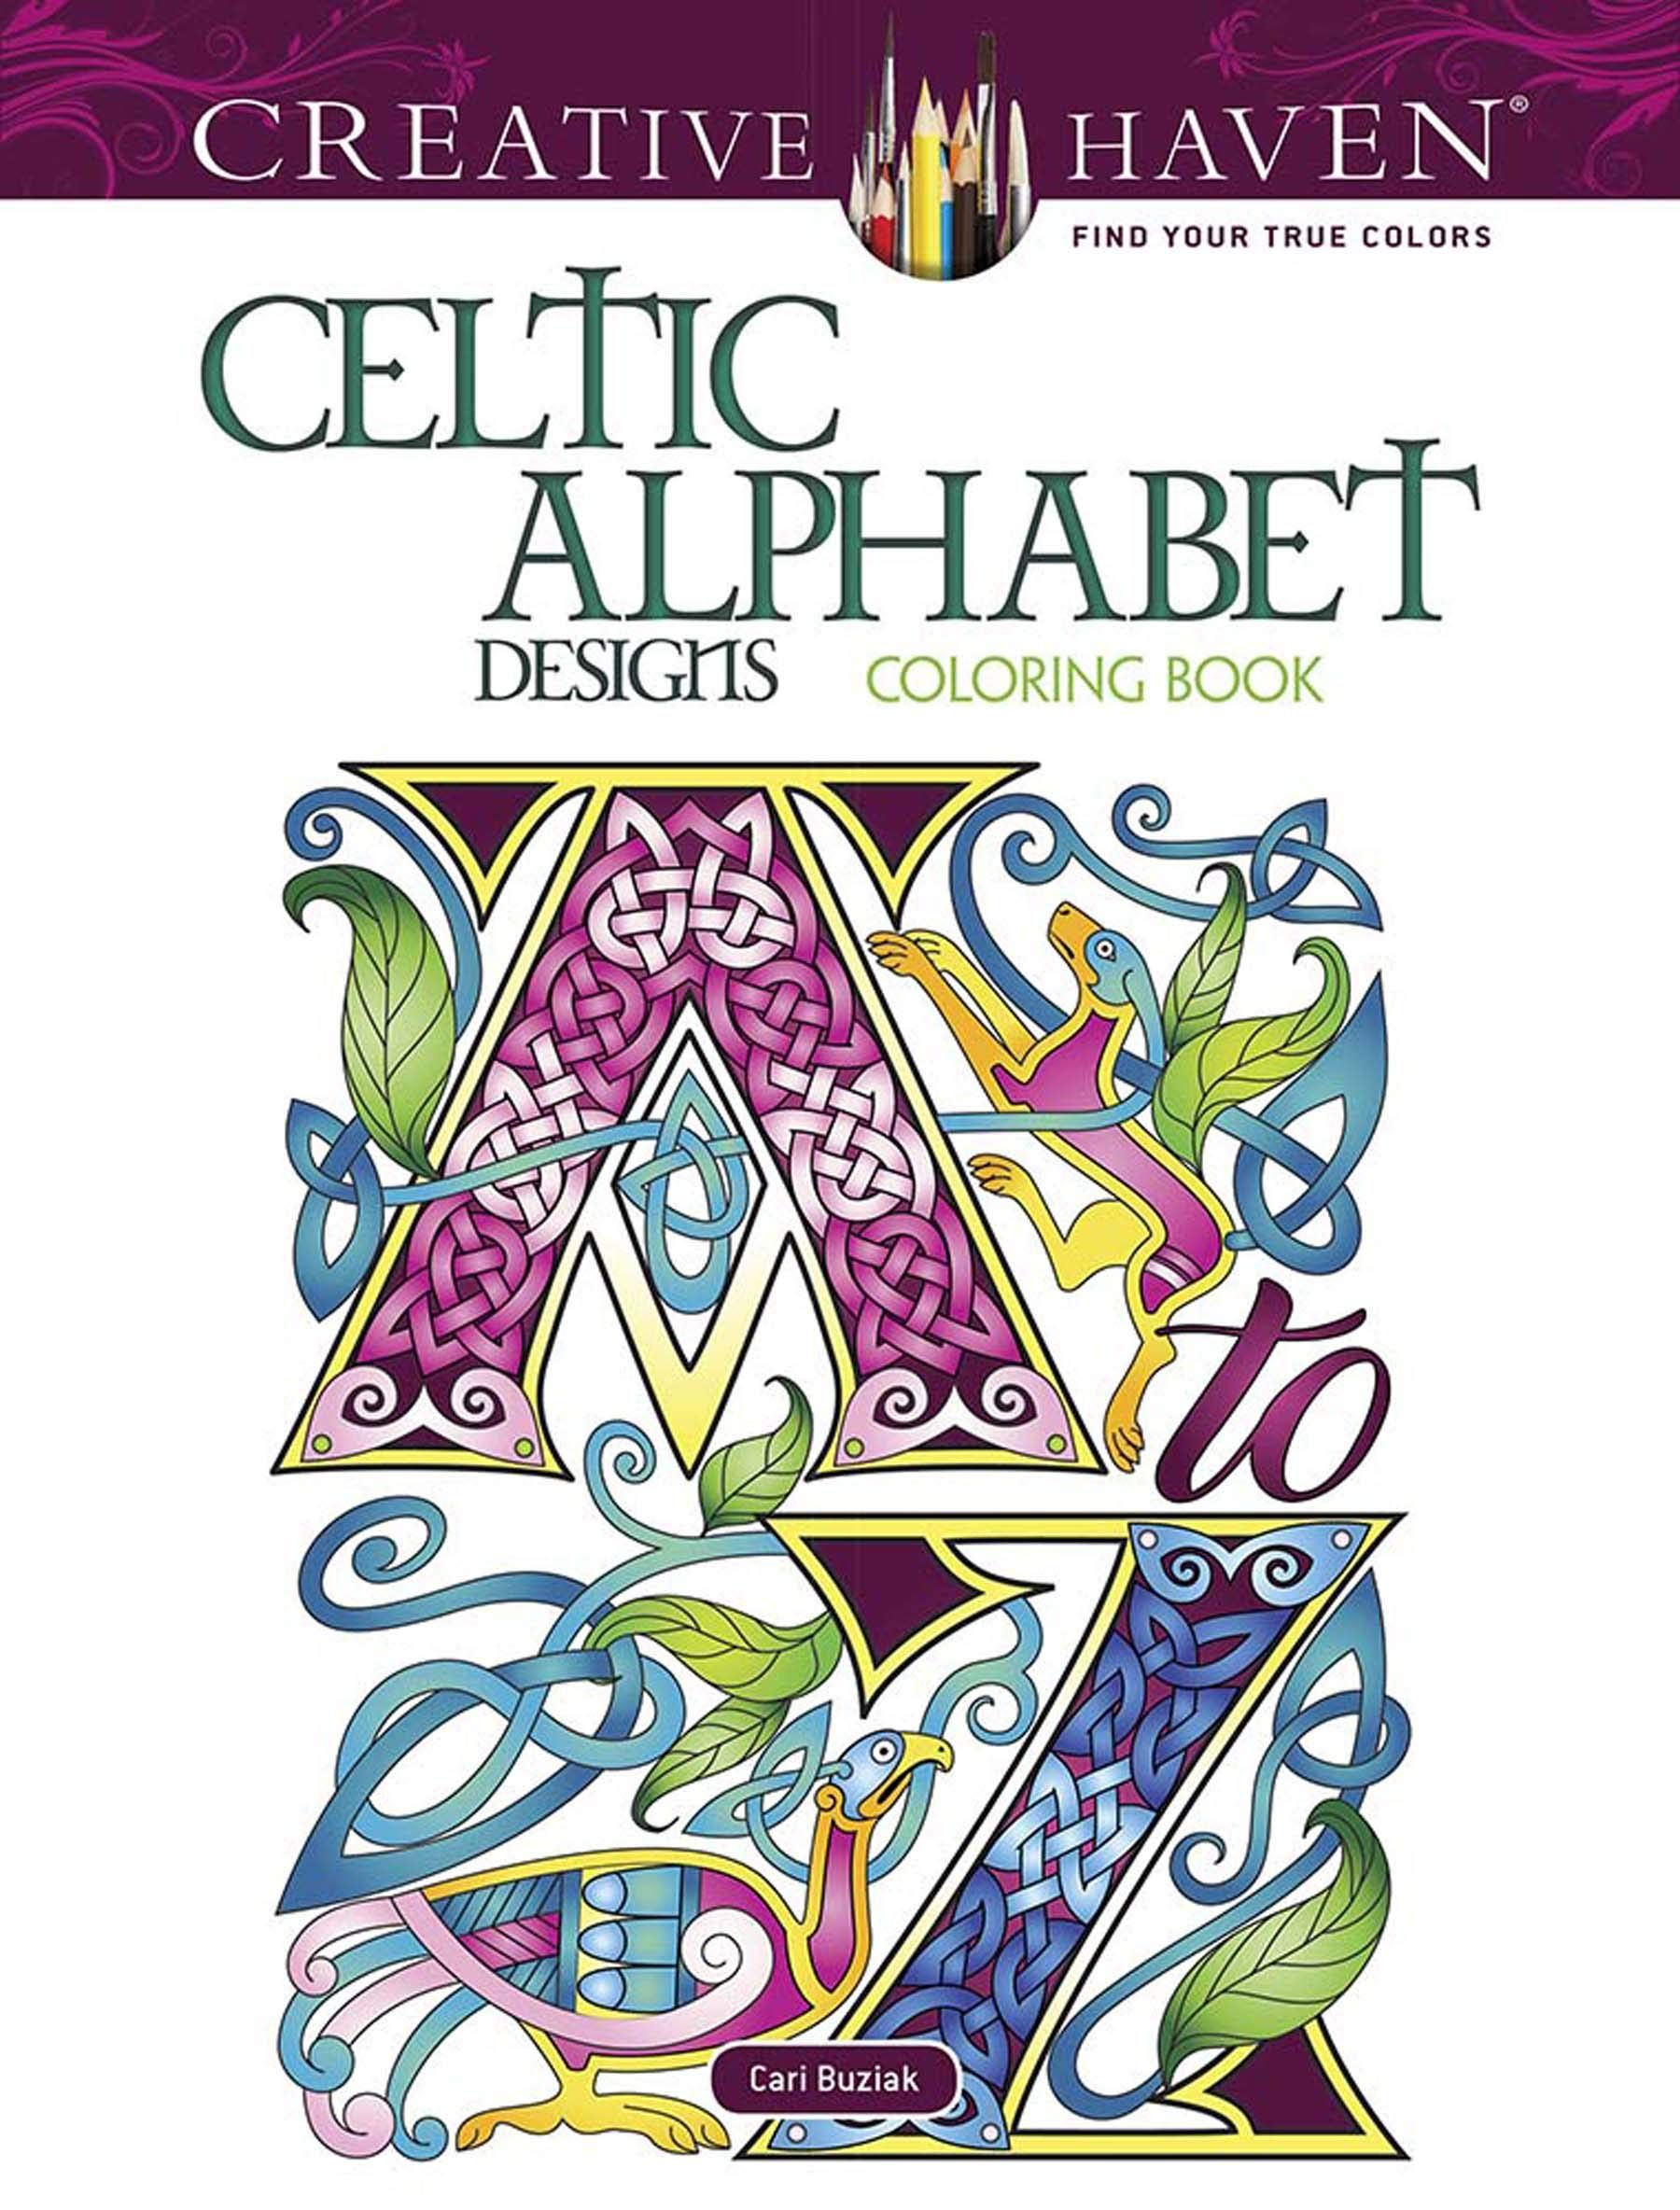 Amazon Com Creative Haven Celtic Alphabet Designs Coloring Book Creative Haven Coloring Designs Coloring Books Creative Haven Coloring Books Celtic Alphabet